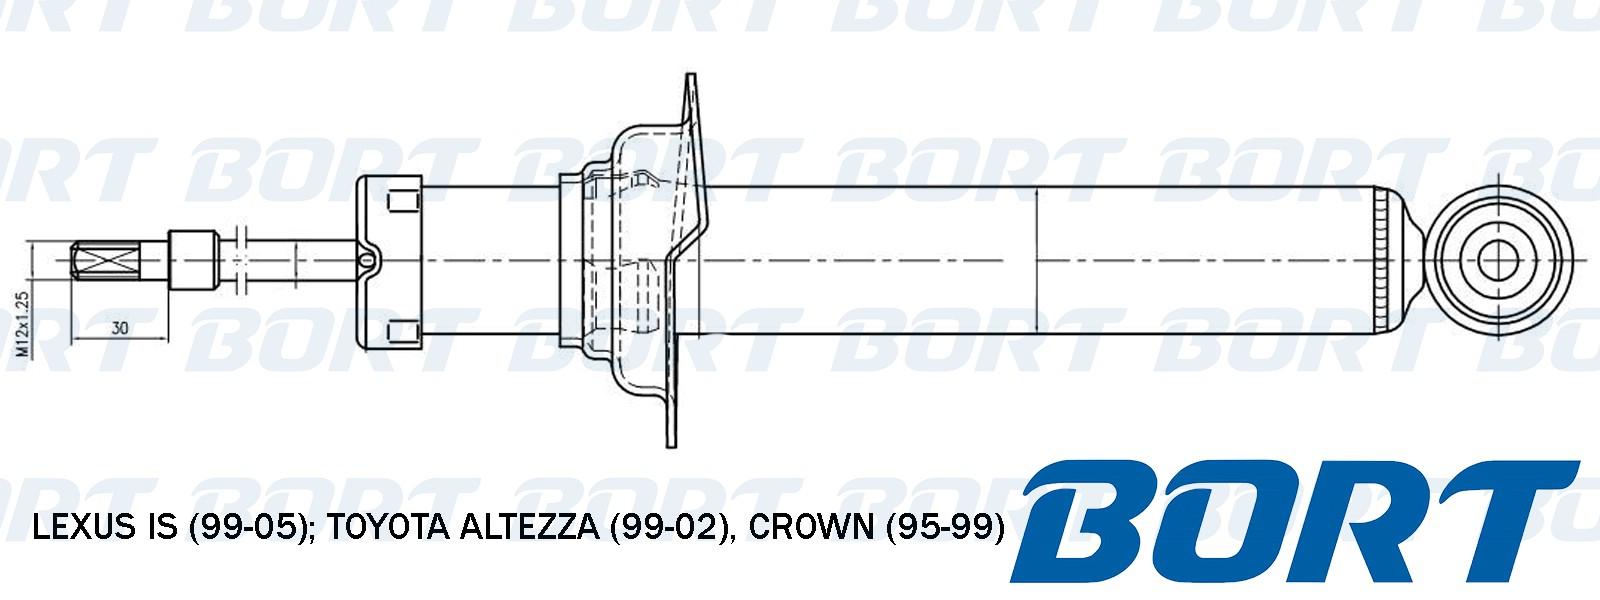 Амортизатор газомасляный передний. BORT (B341262)